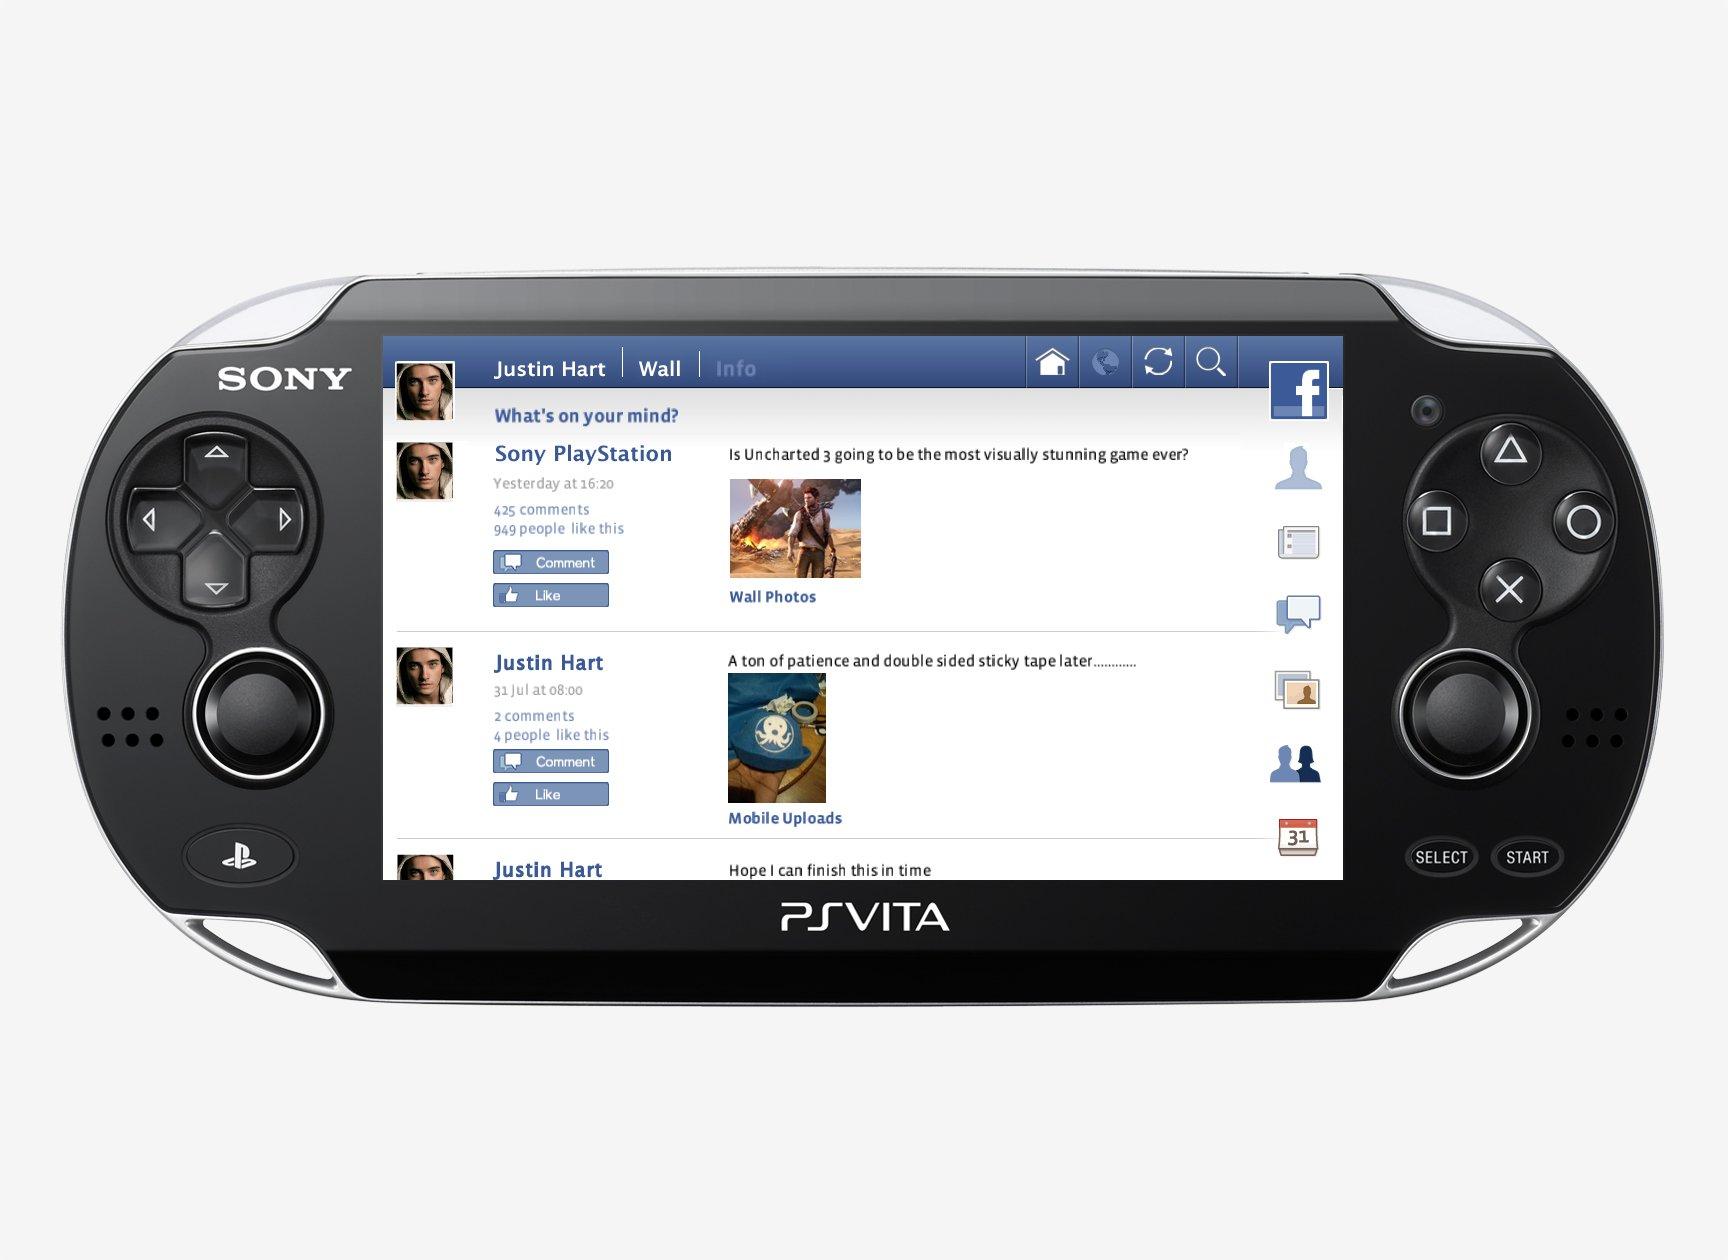 [Image: PlayStation-Vita_2011_08-18-11_004.jpg]